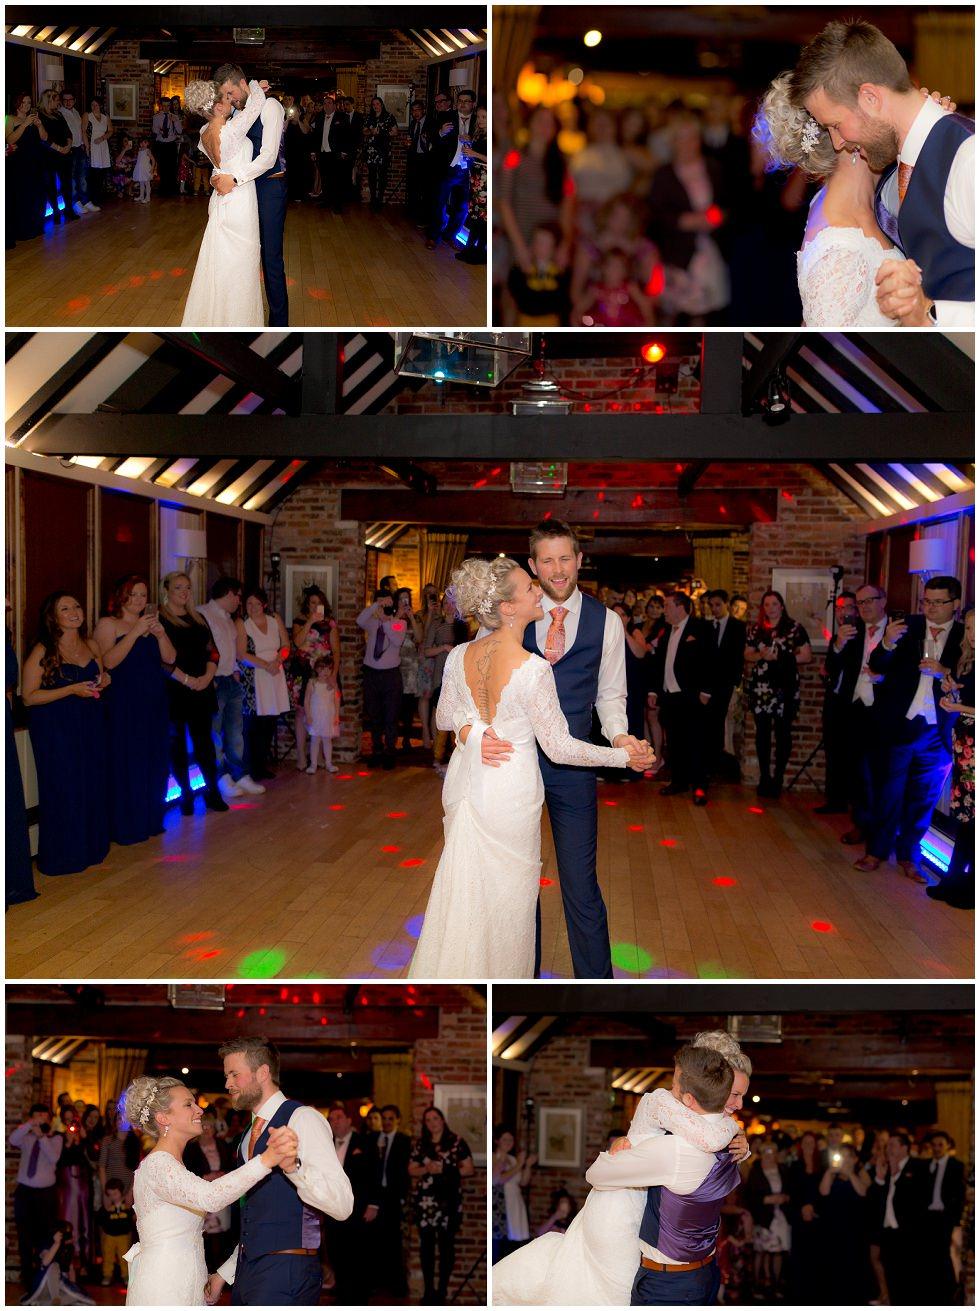 Wedding at Locko Park Derbyshire 20